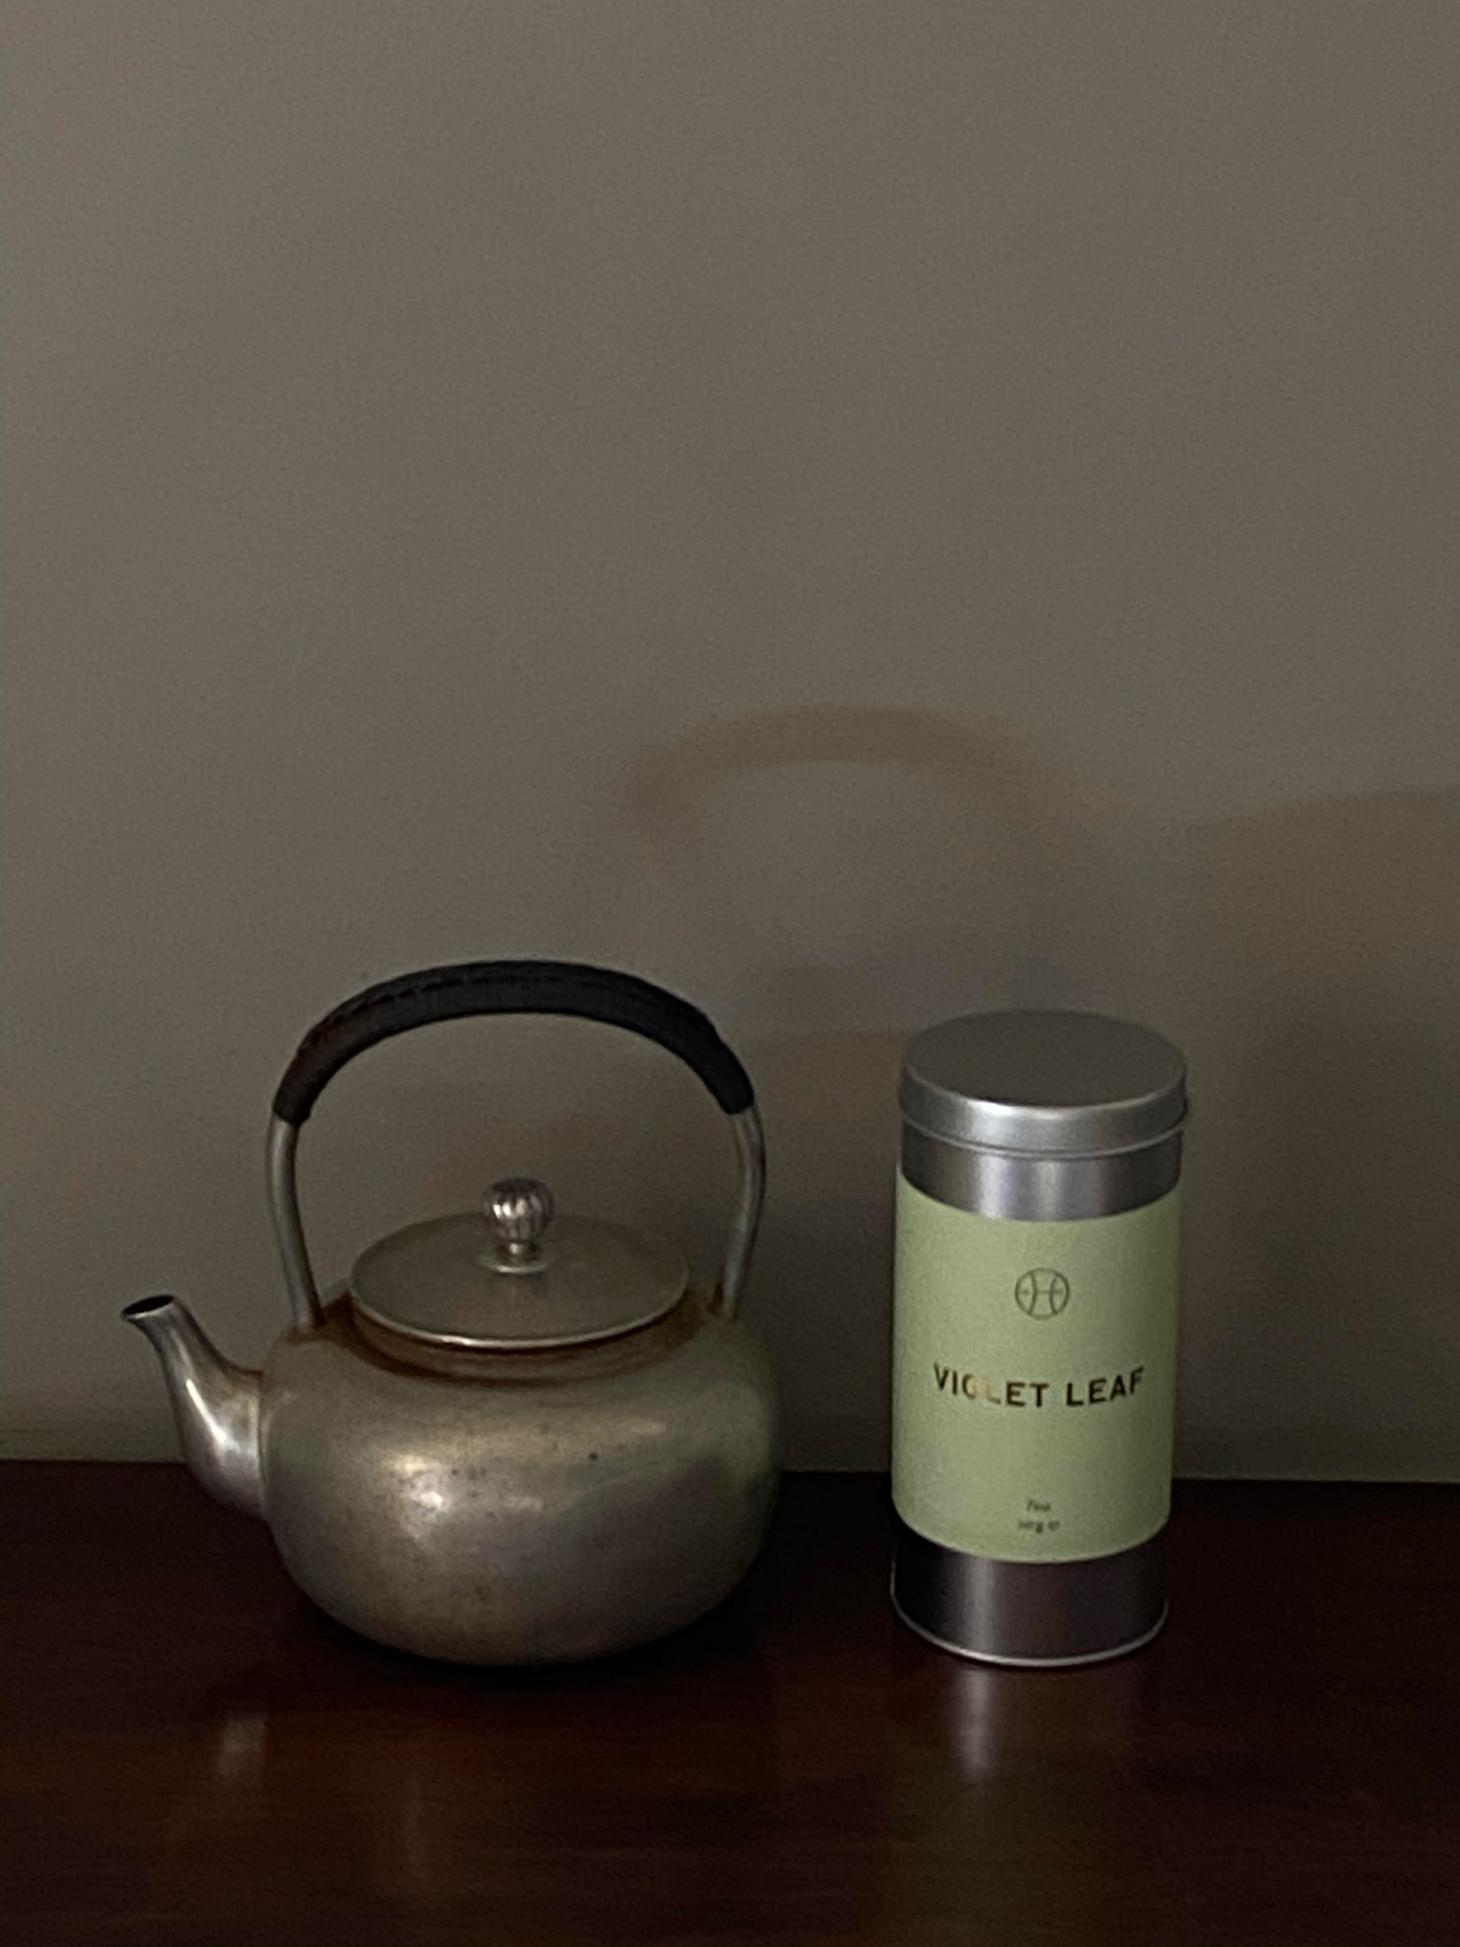 perfumer h jasmine tea on silver plate with silver tea pot